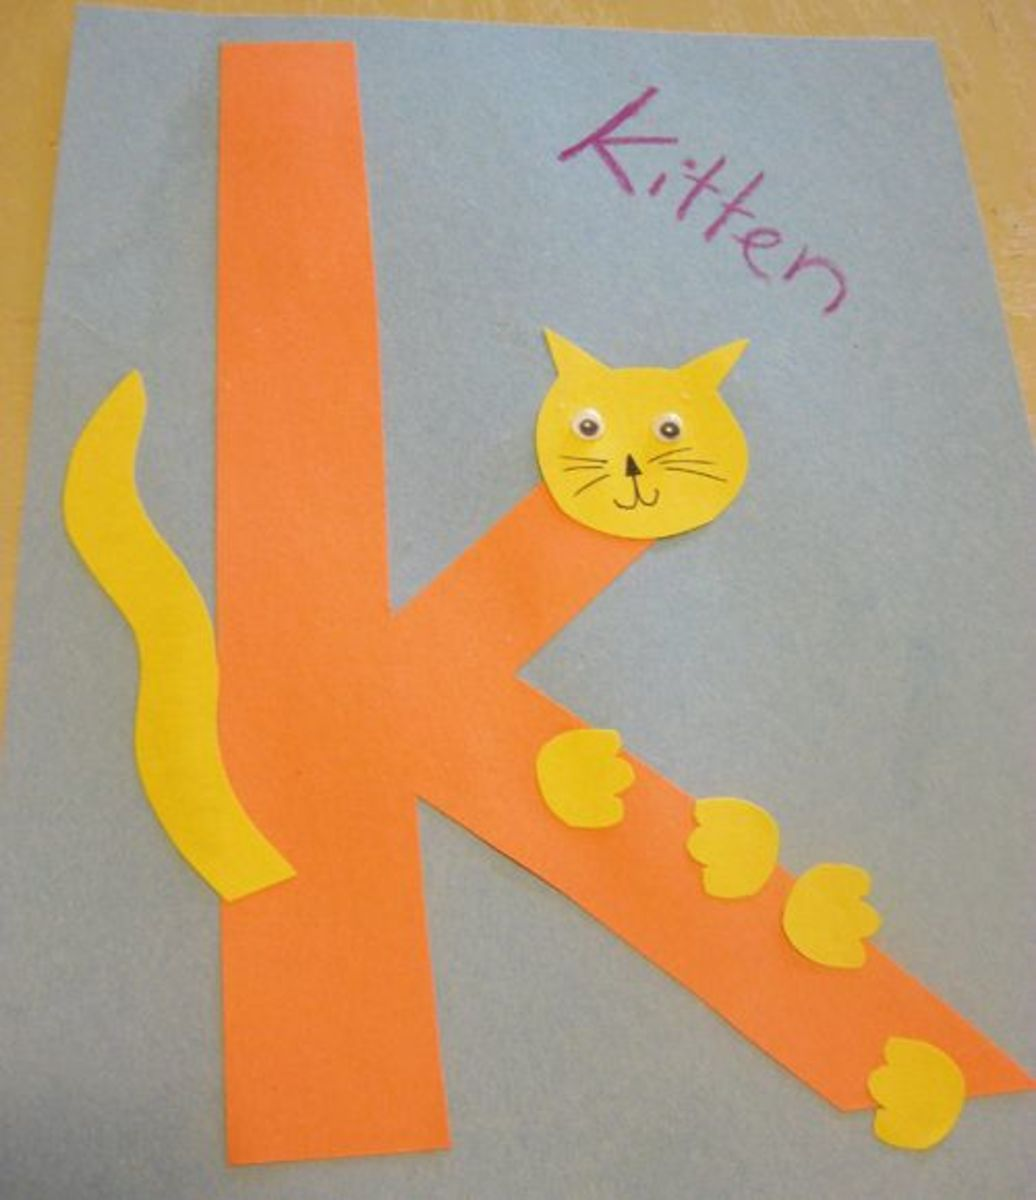 Letter K Alphabet Activities For Kids